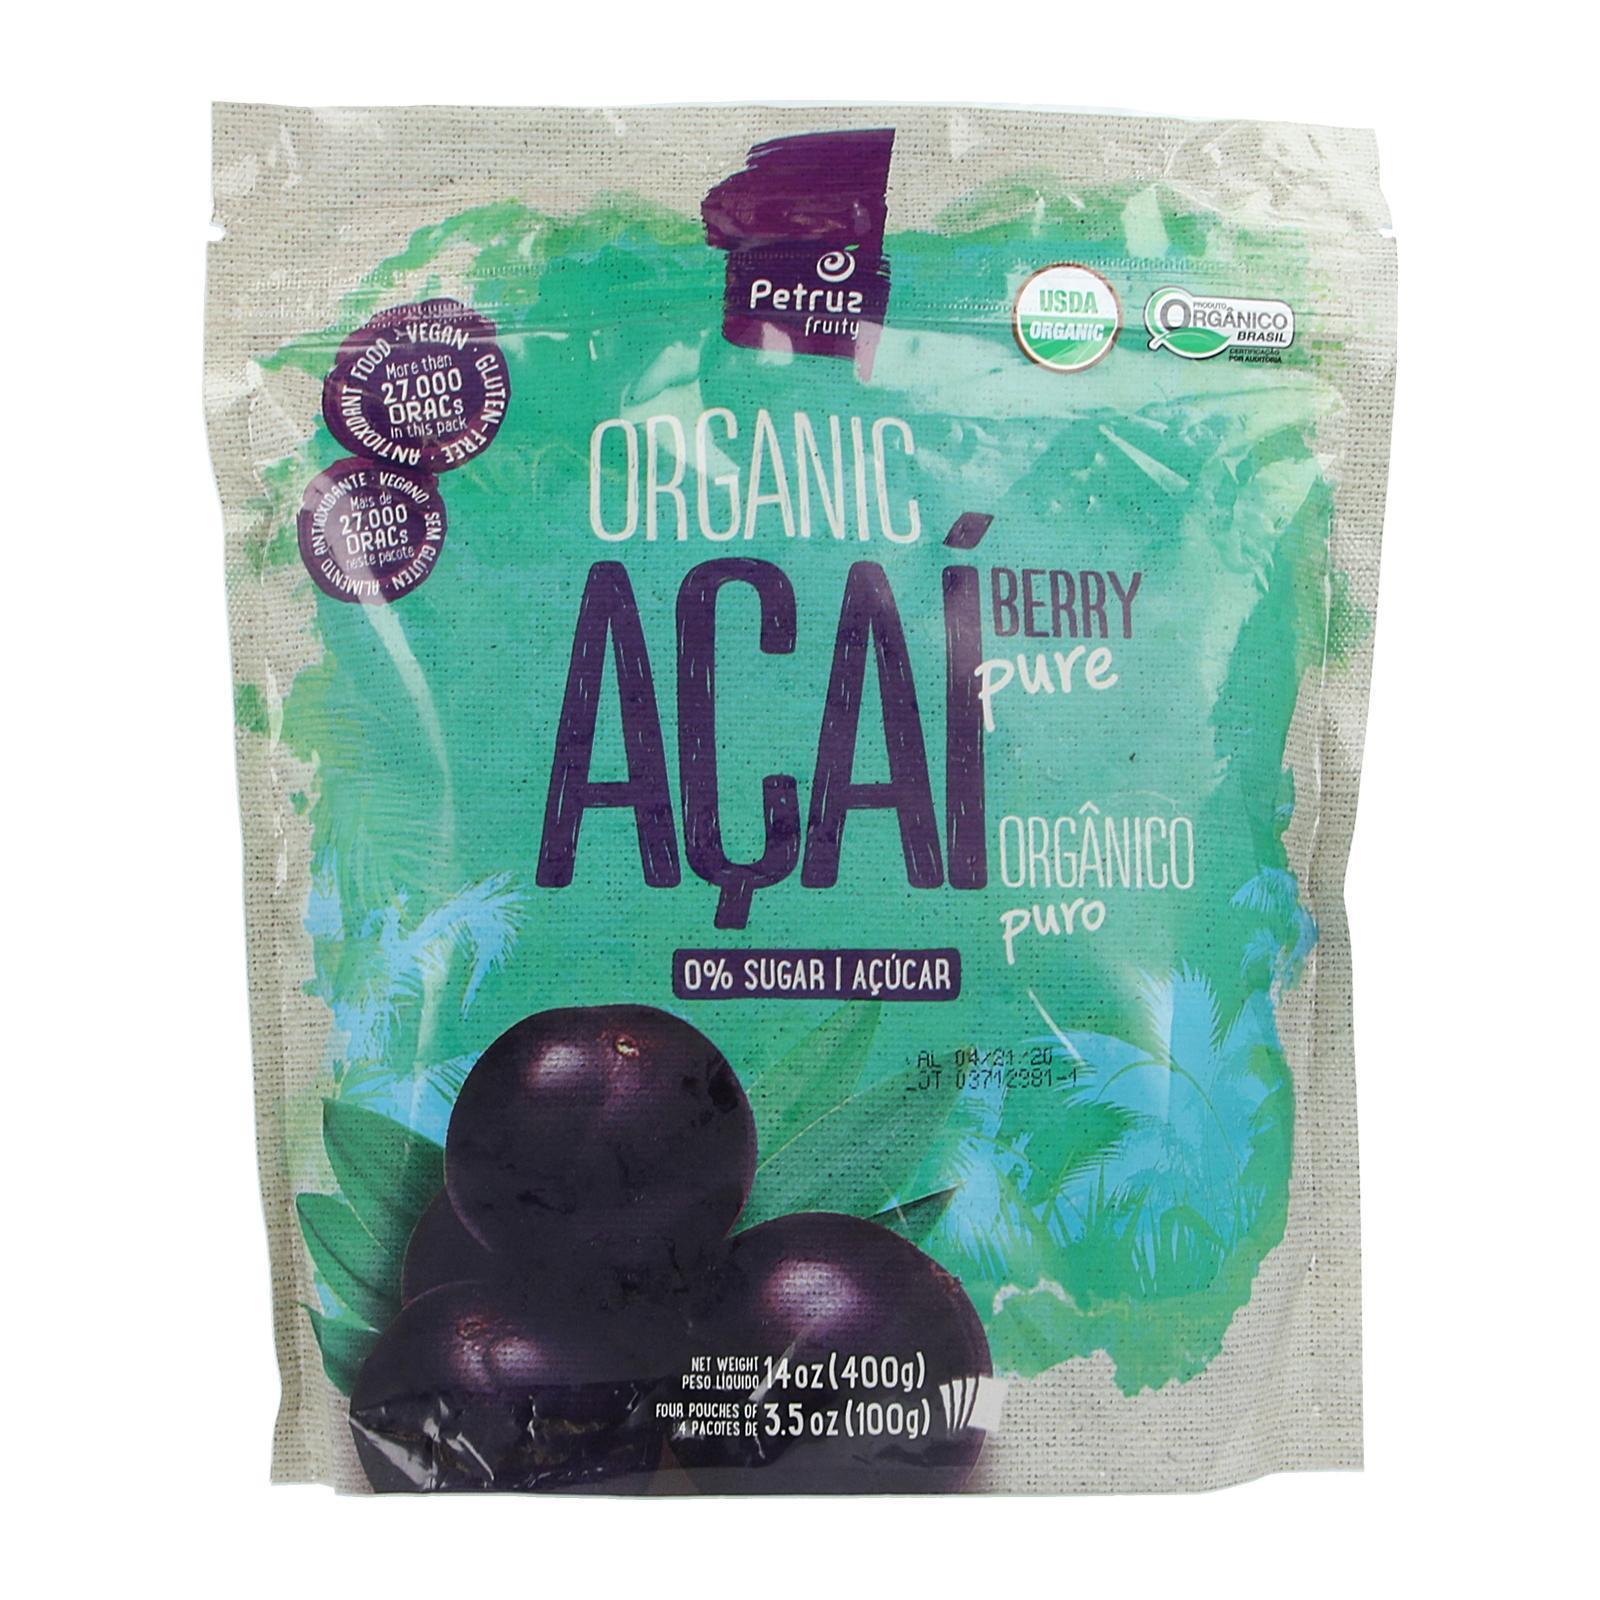 Petruz Acai Organic Acai Berry Pulp Pure - Frozen By Redmart.